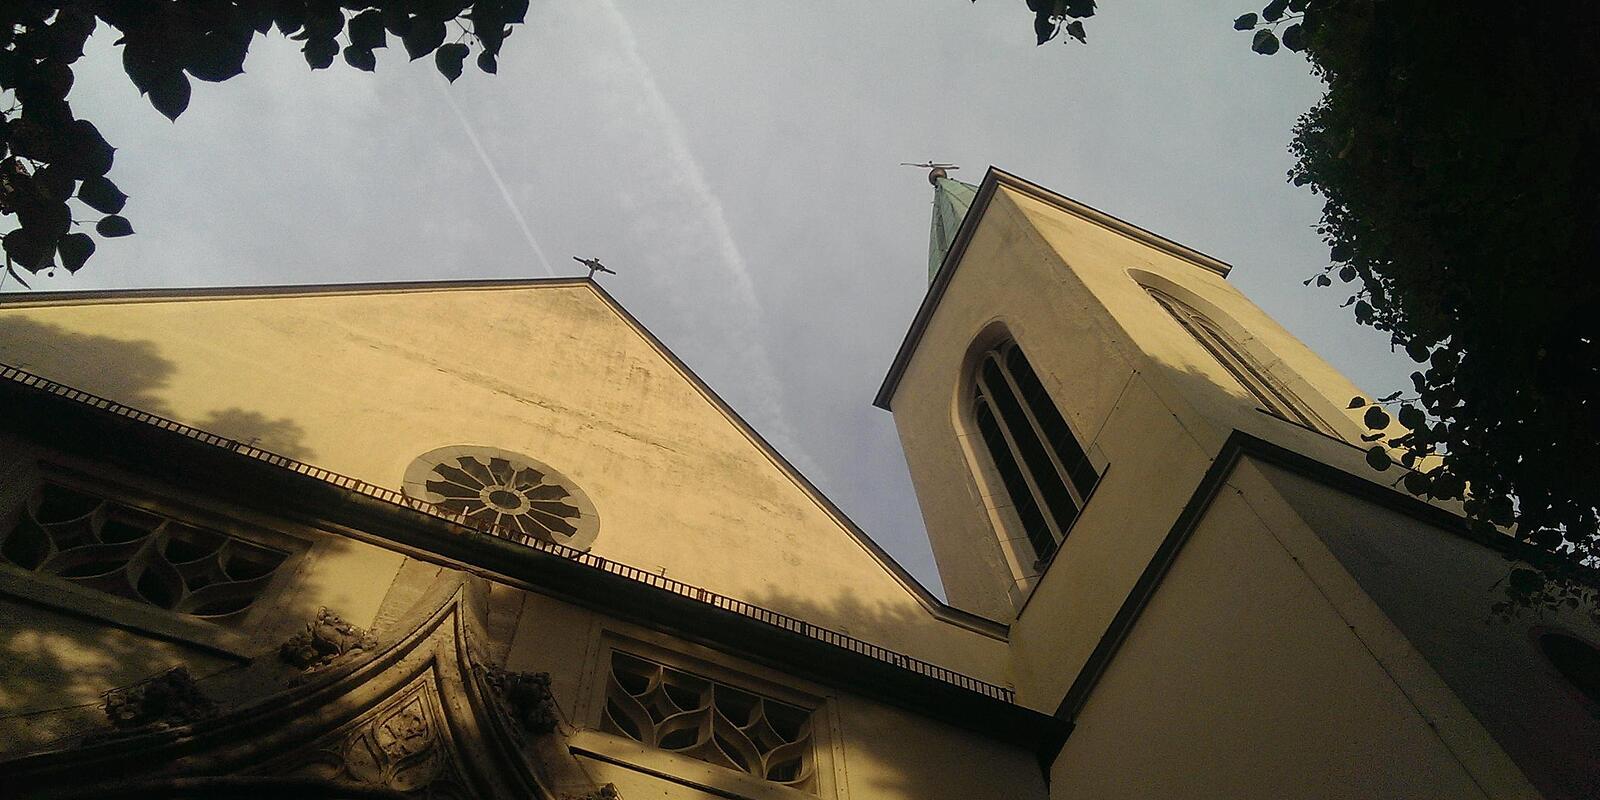 Christuskirche München Neuhausen